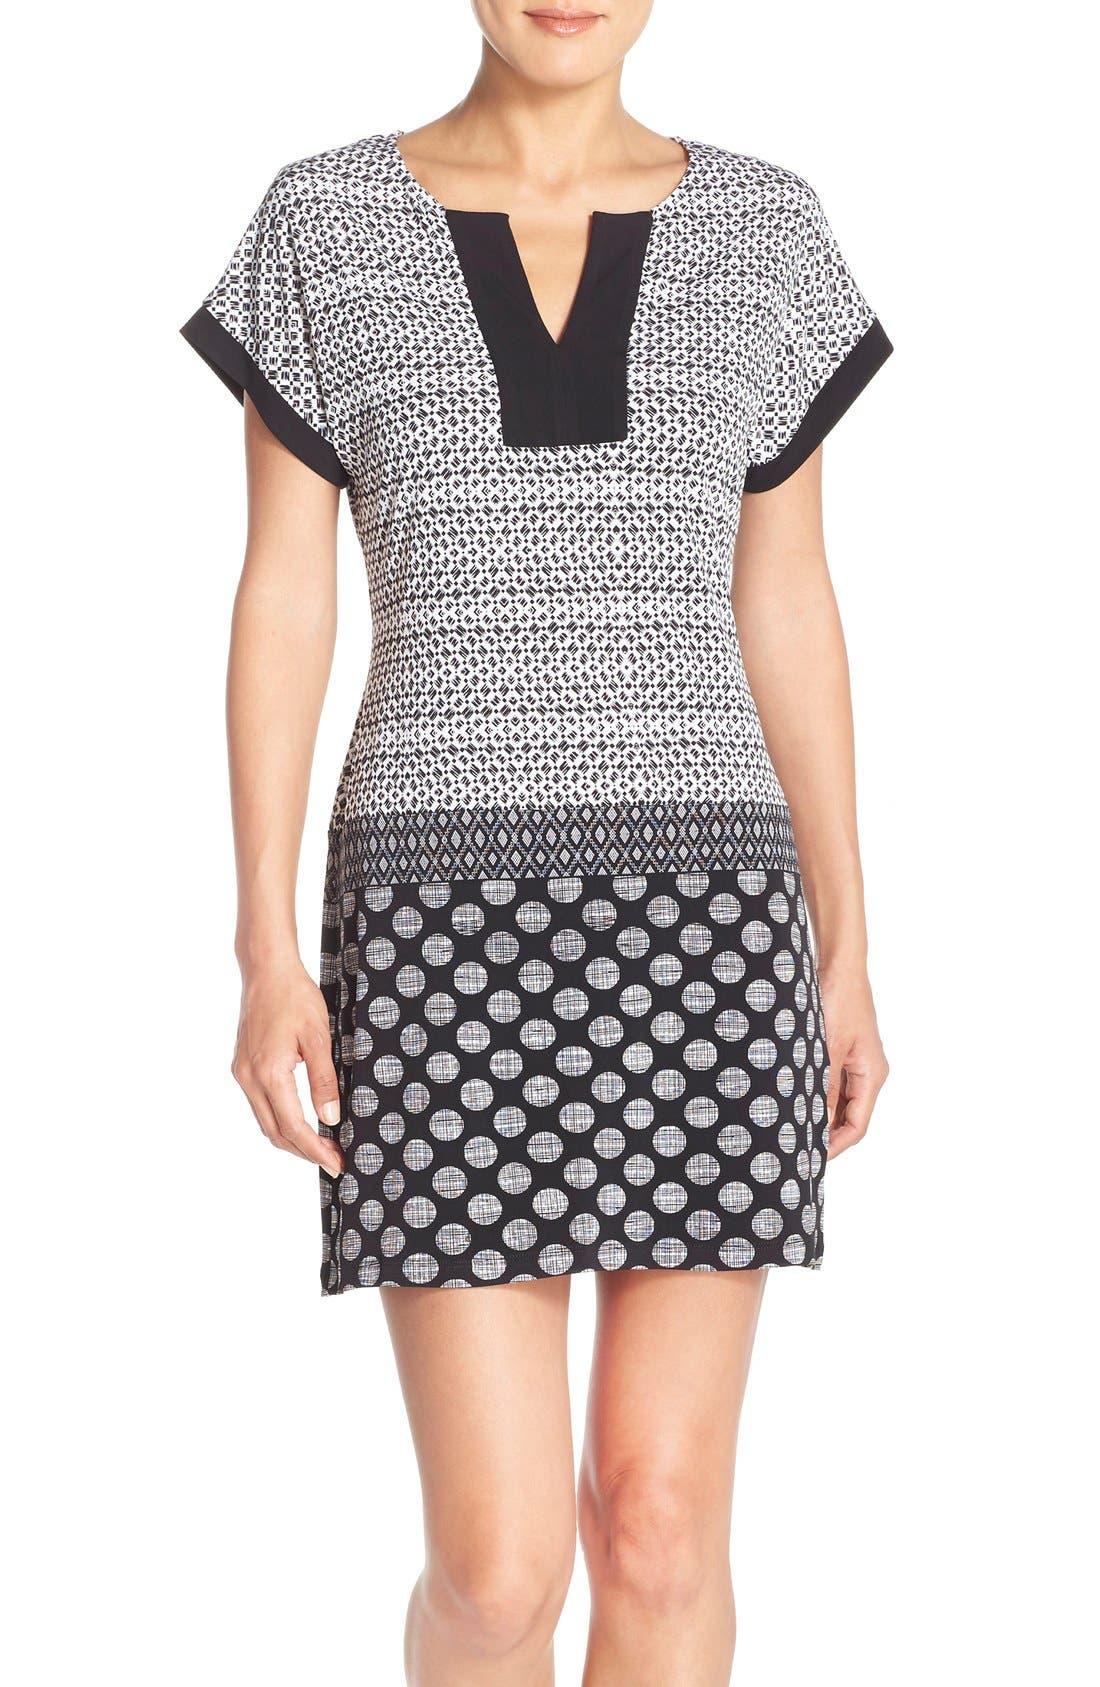 Alternate Image 1 Selected - London Times Mixed Print Jersey Shift Dress